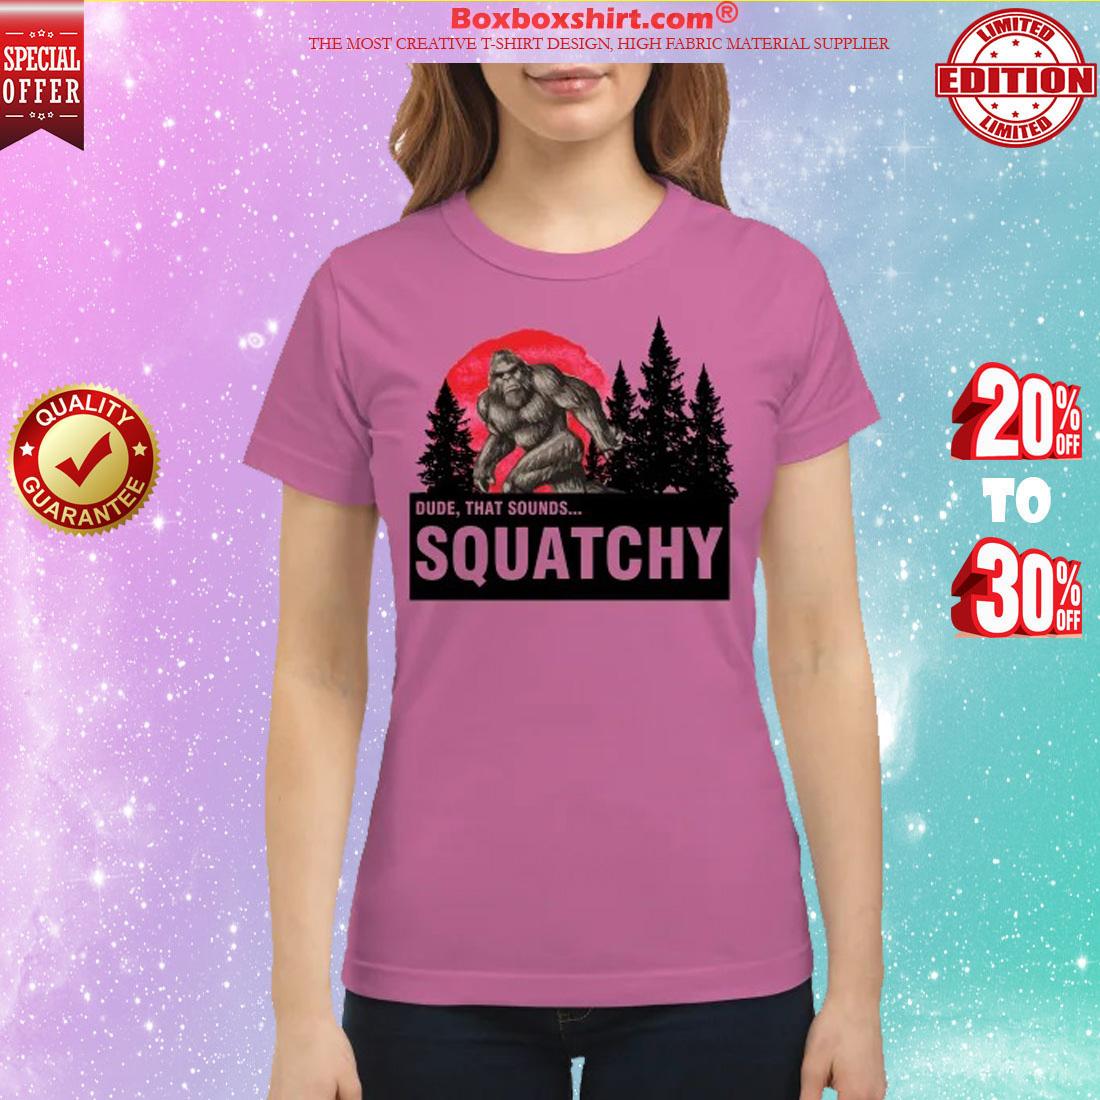 Dude that sounds squatchy classic shirt